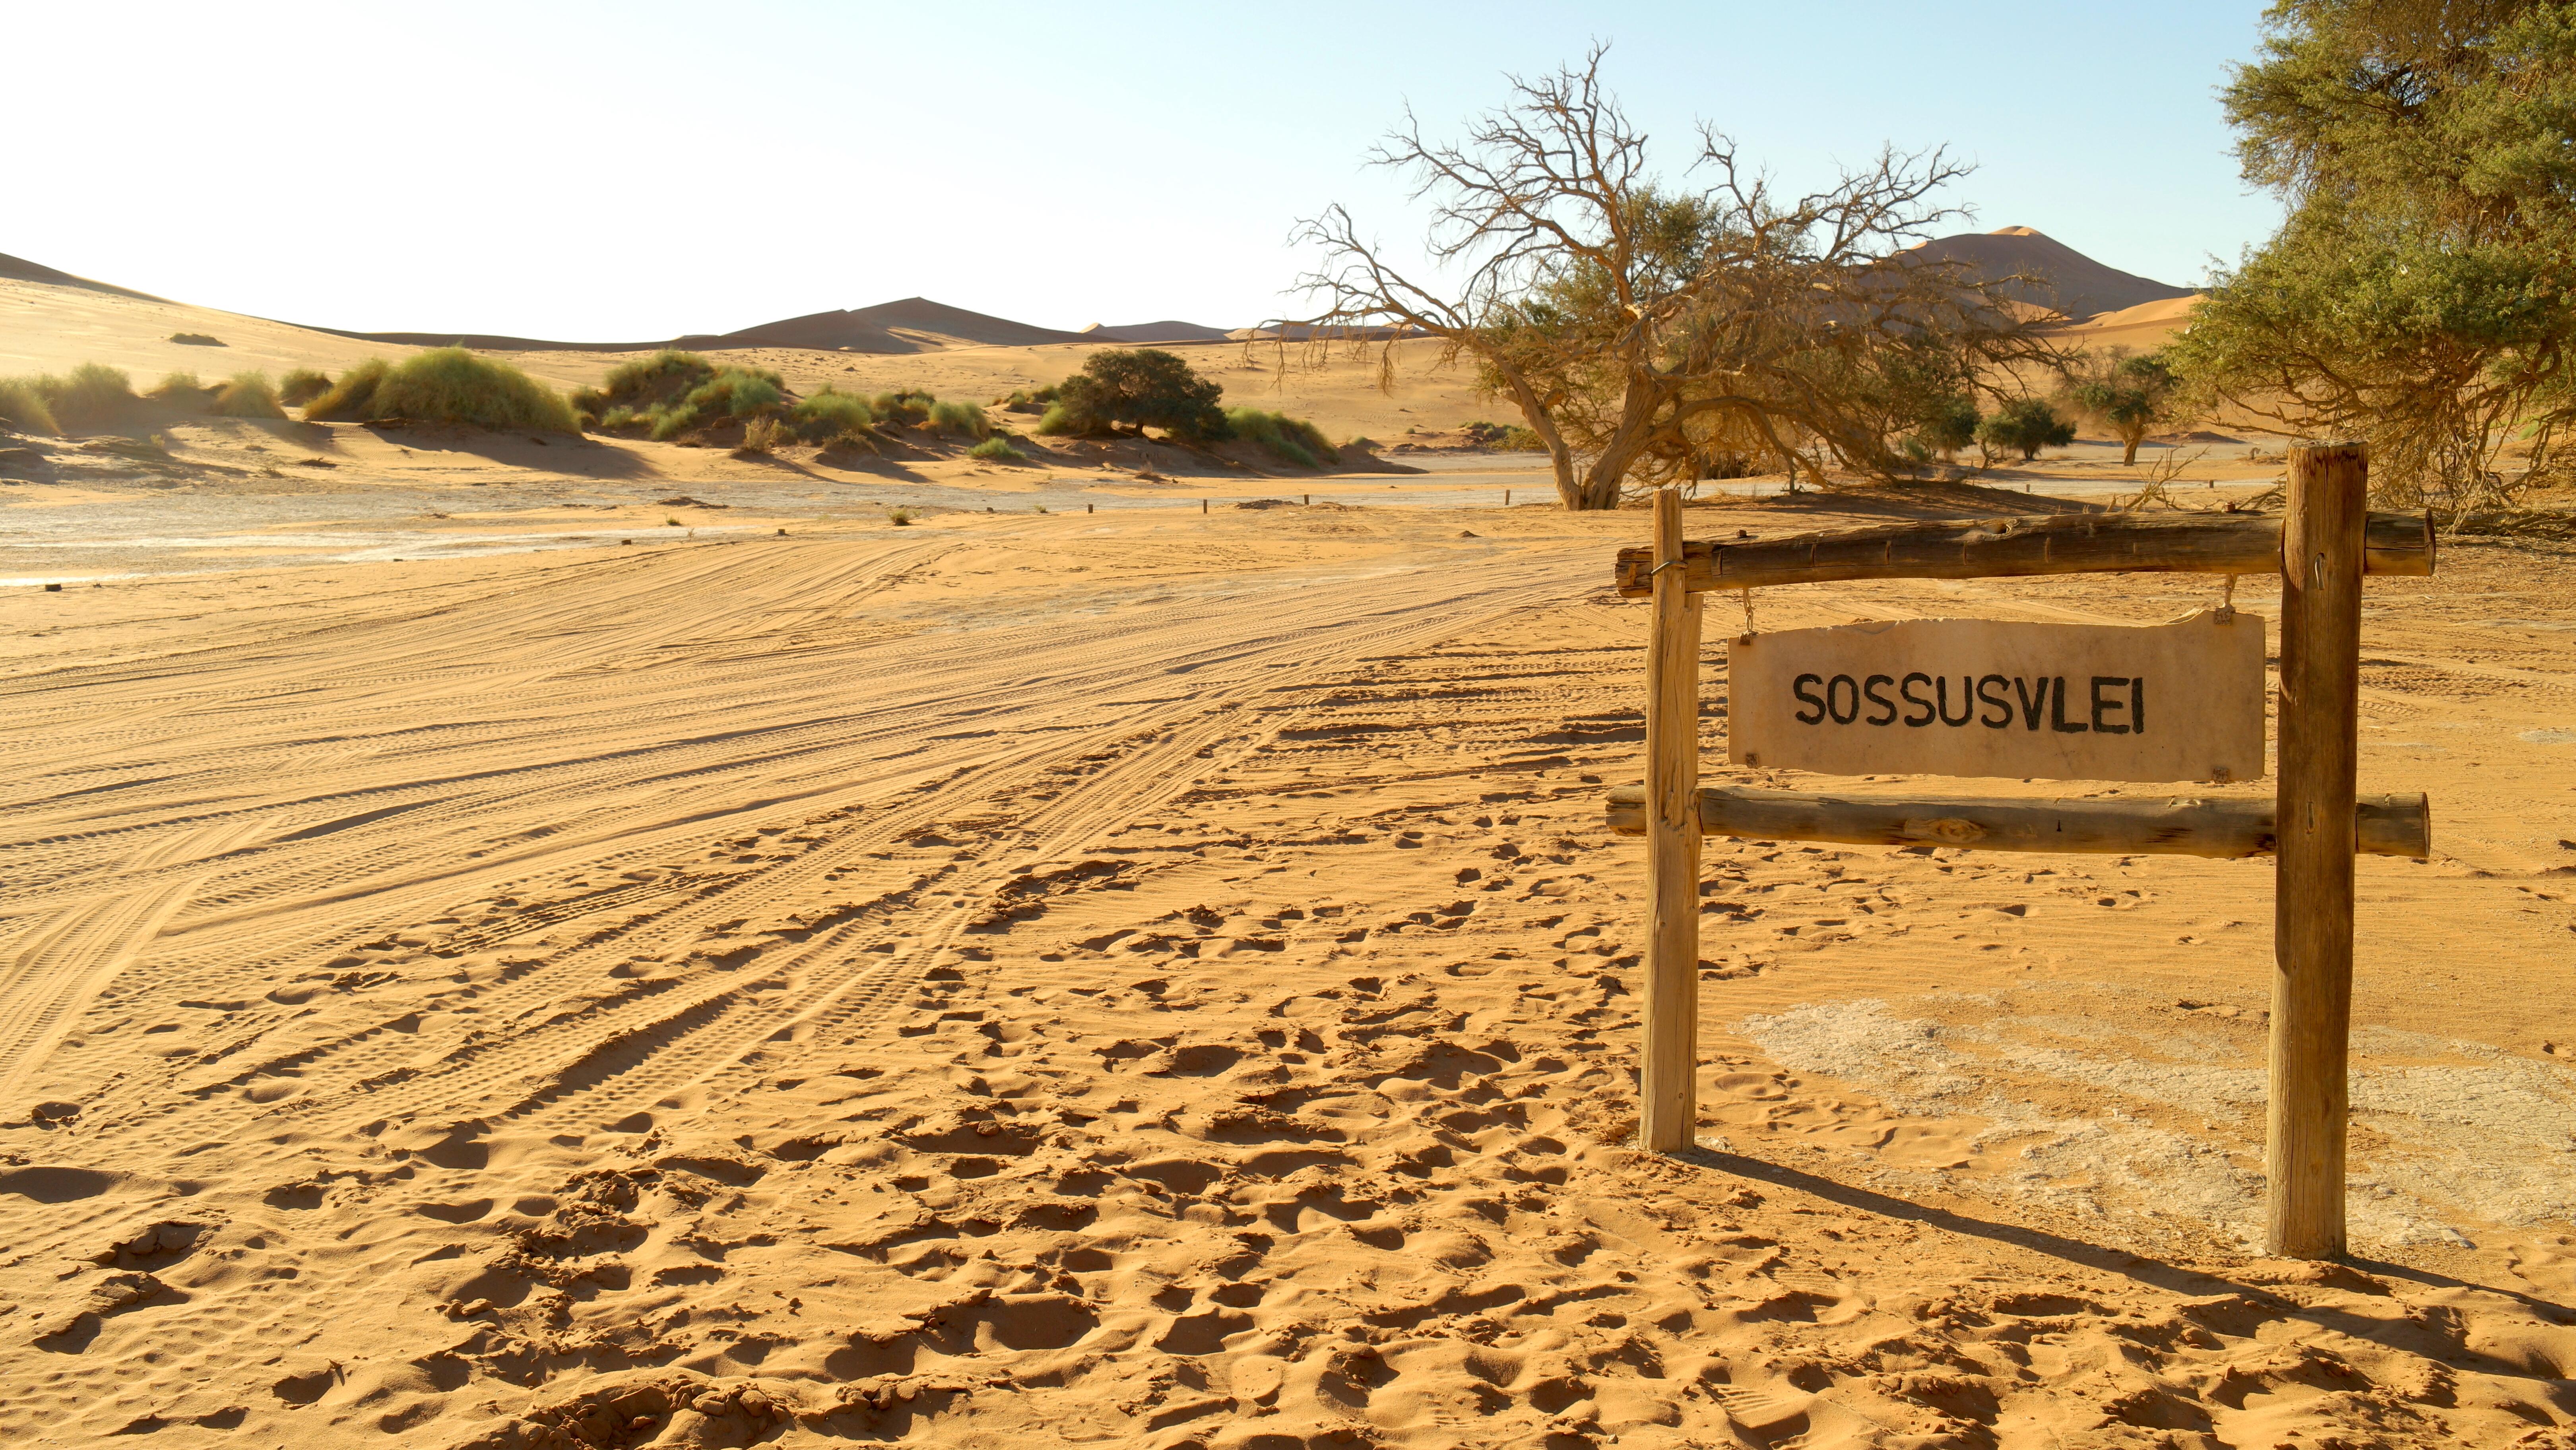 sossusvlei-namibia-africa-lustforthesublime